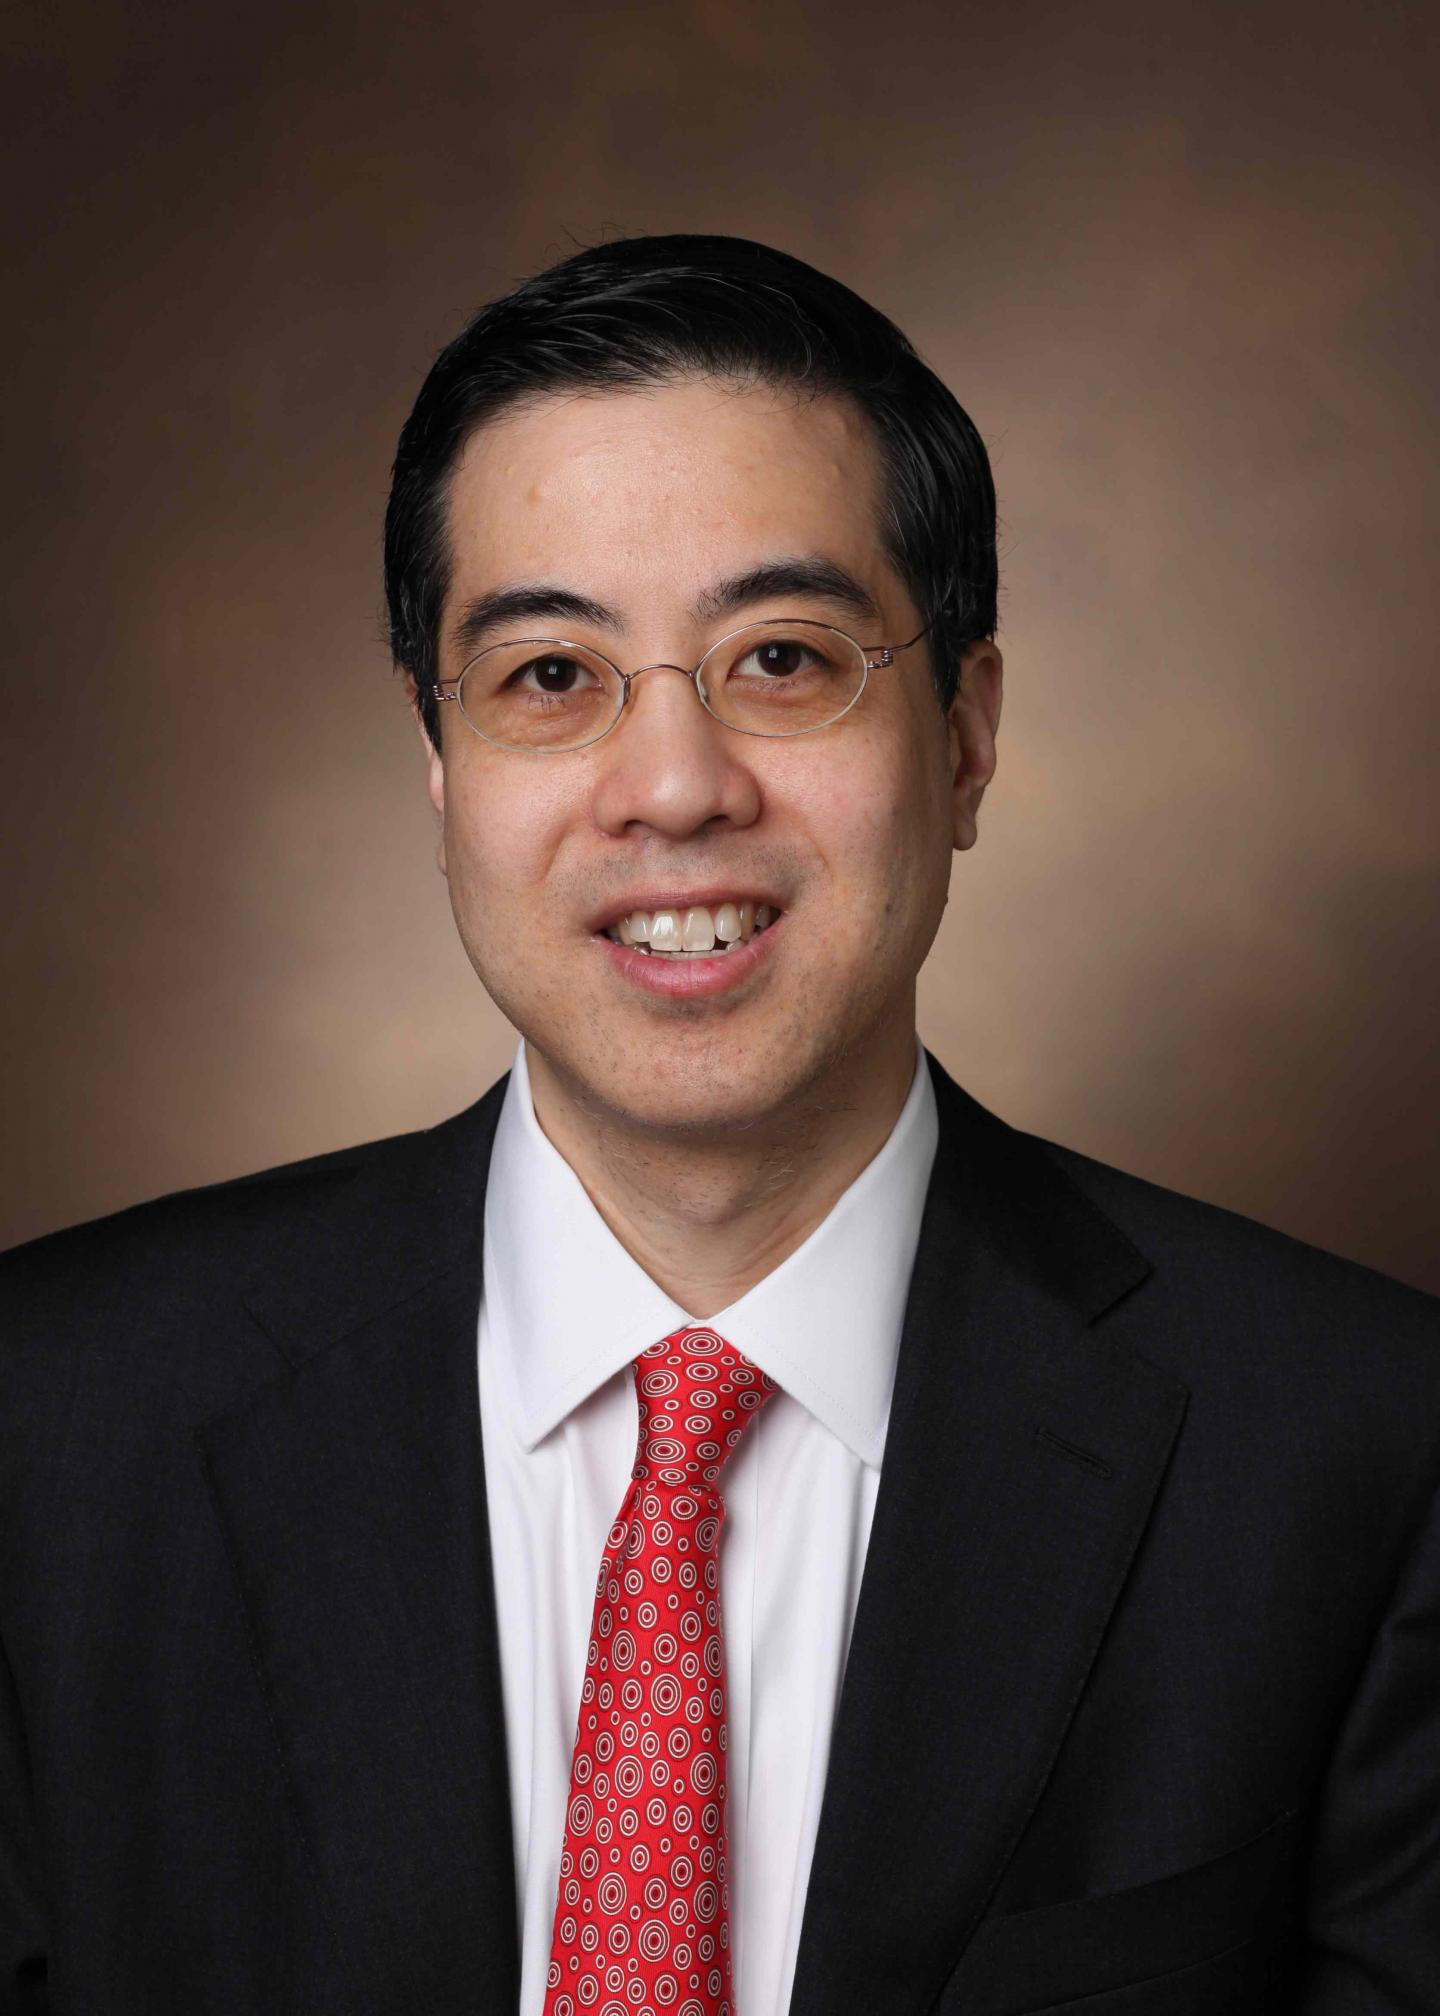 Dr. Thomas Wang, Vanderbilt University Medical Center